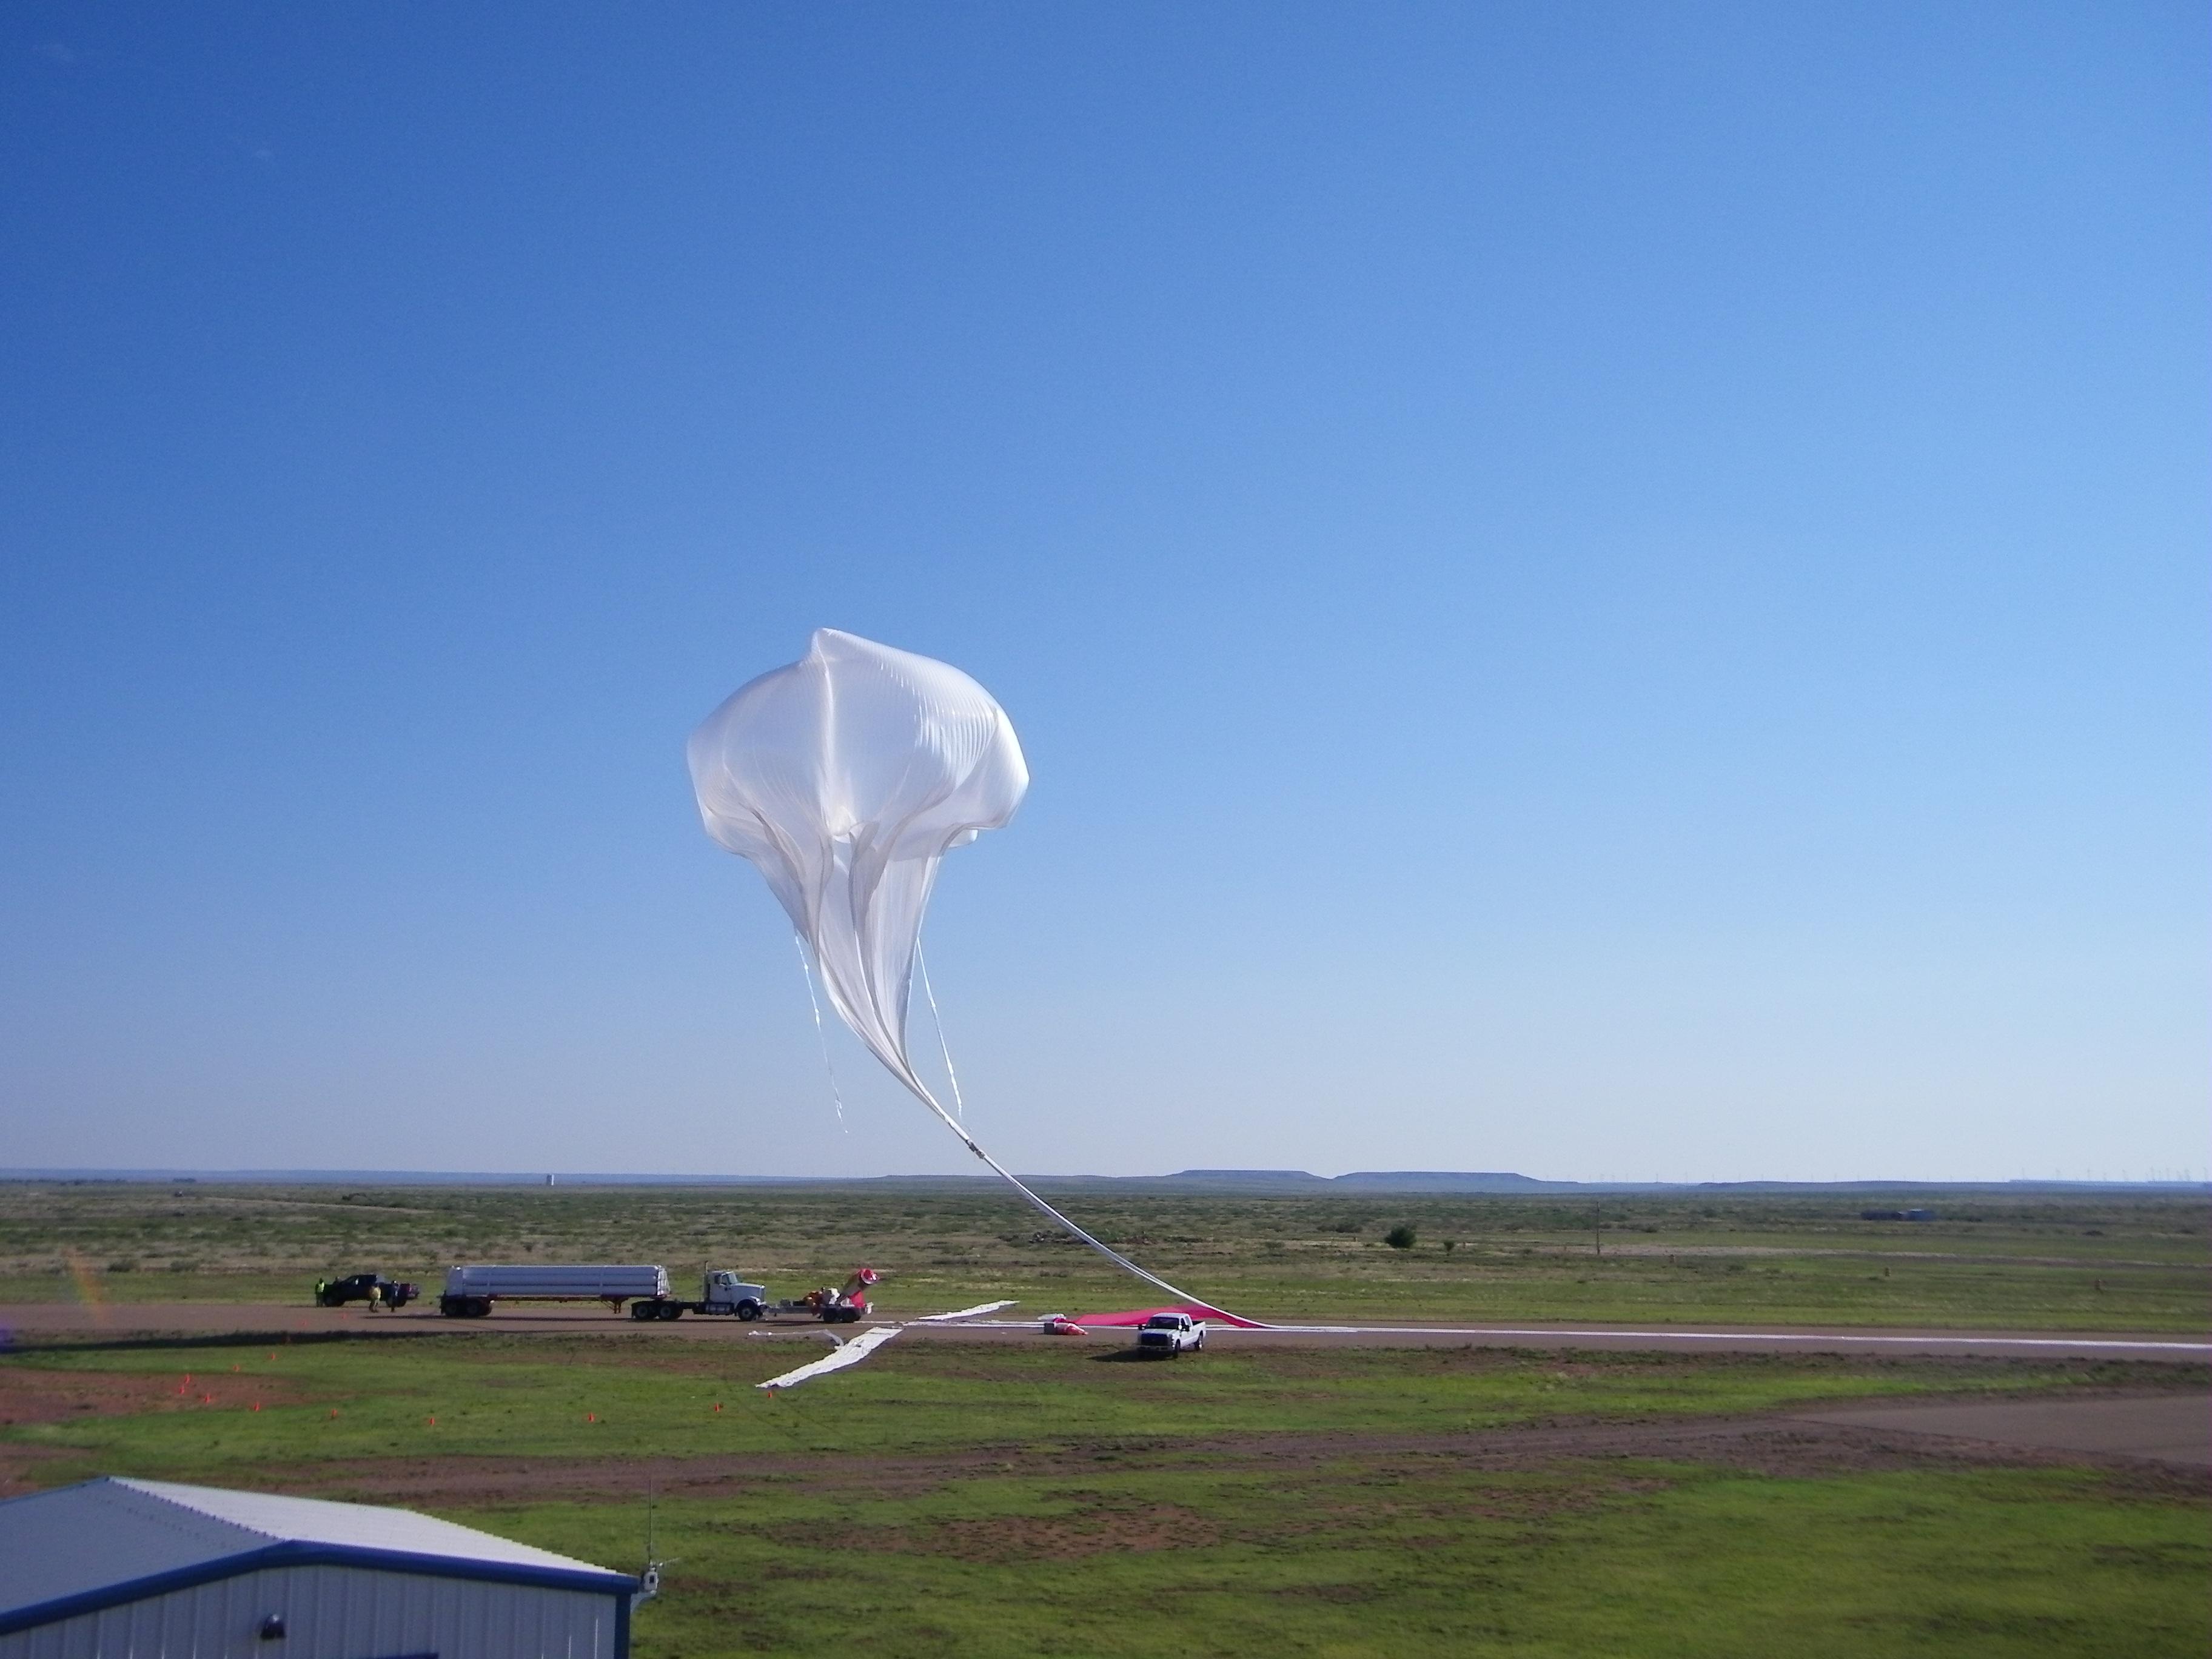 Touchdown! NASA's Football Stadium-sized Science Balloon